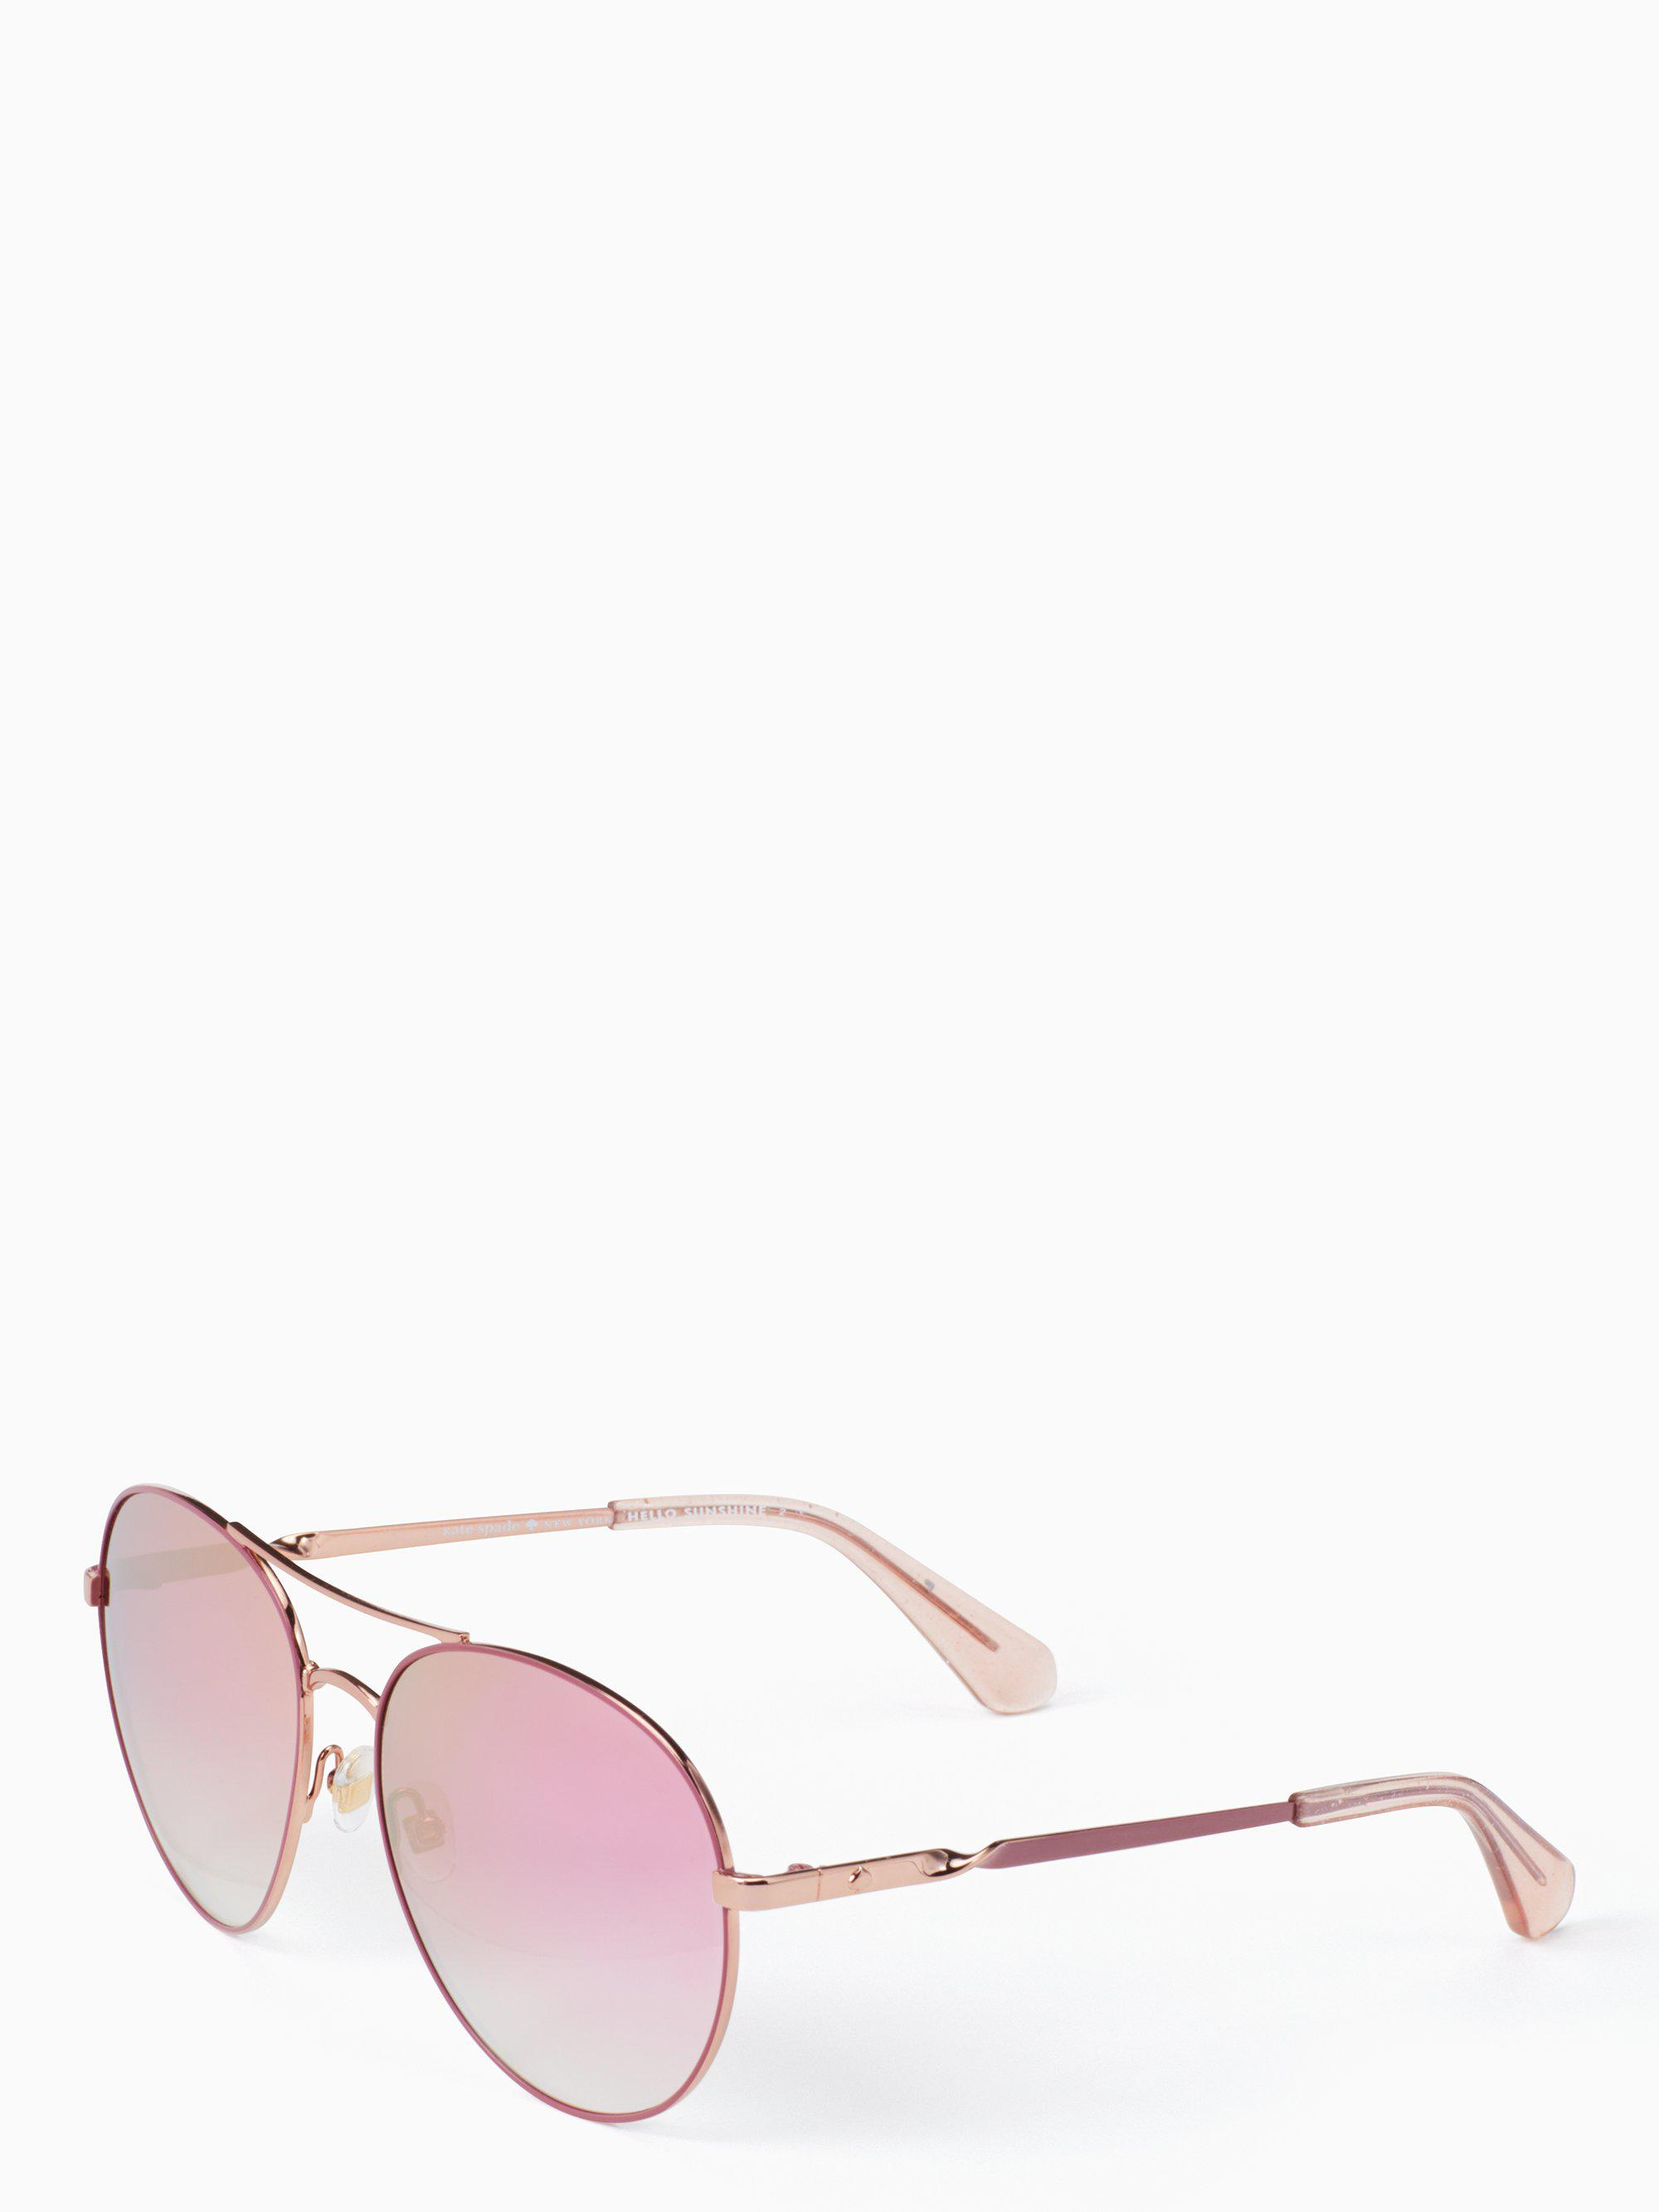 49ec65f481283 Kate Spade. Women s Pink Joshelle Sunglasses.  160 From kate spade new york